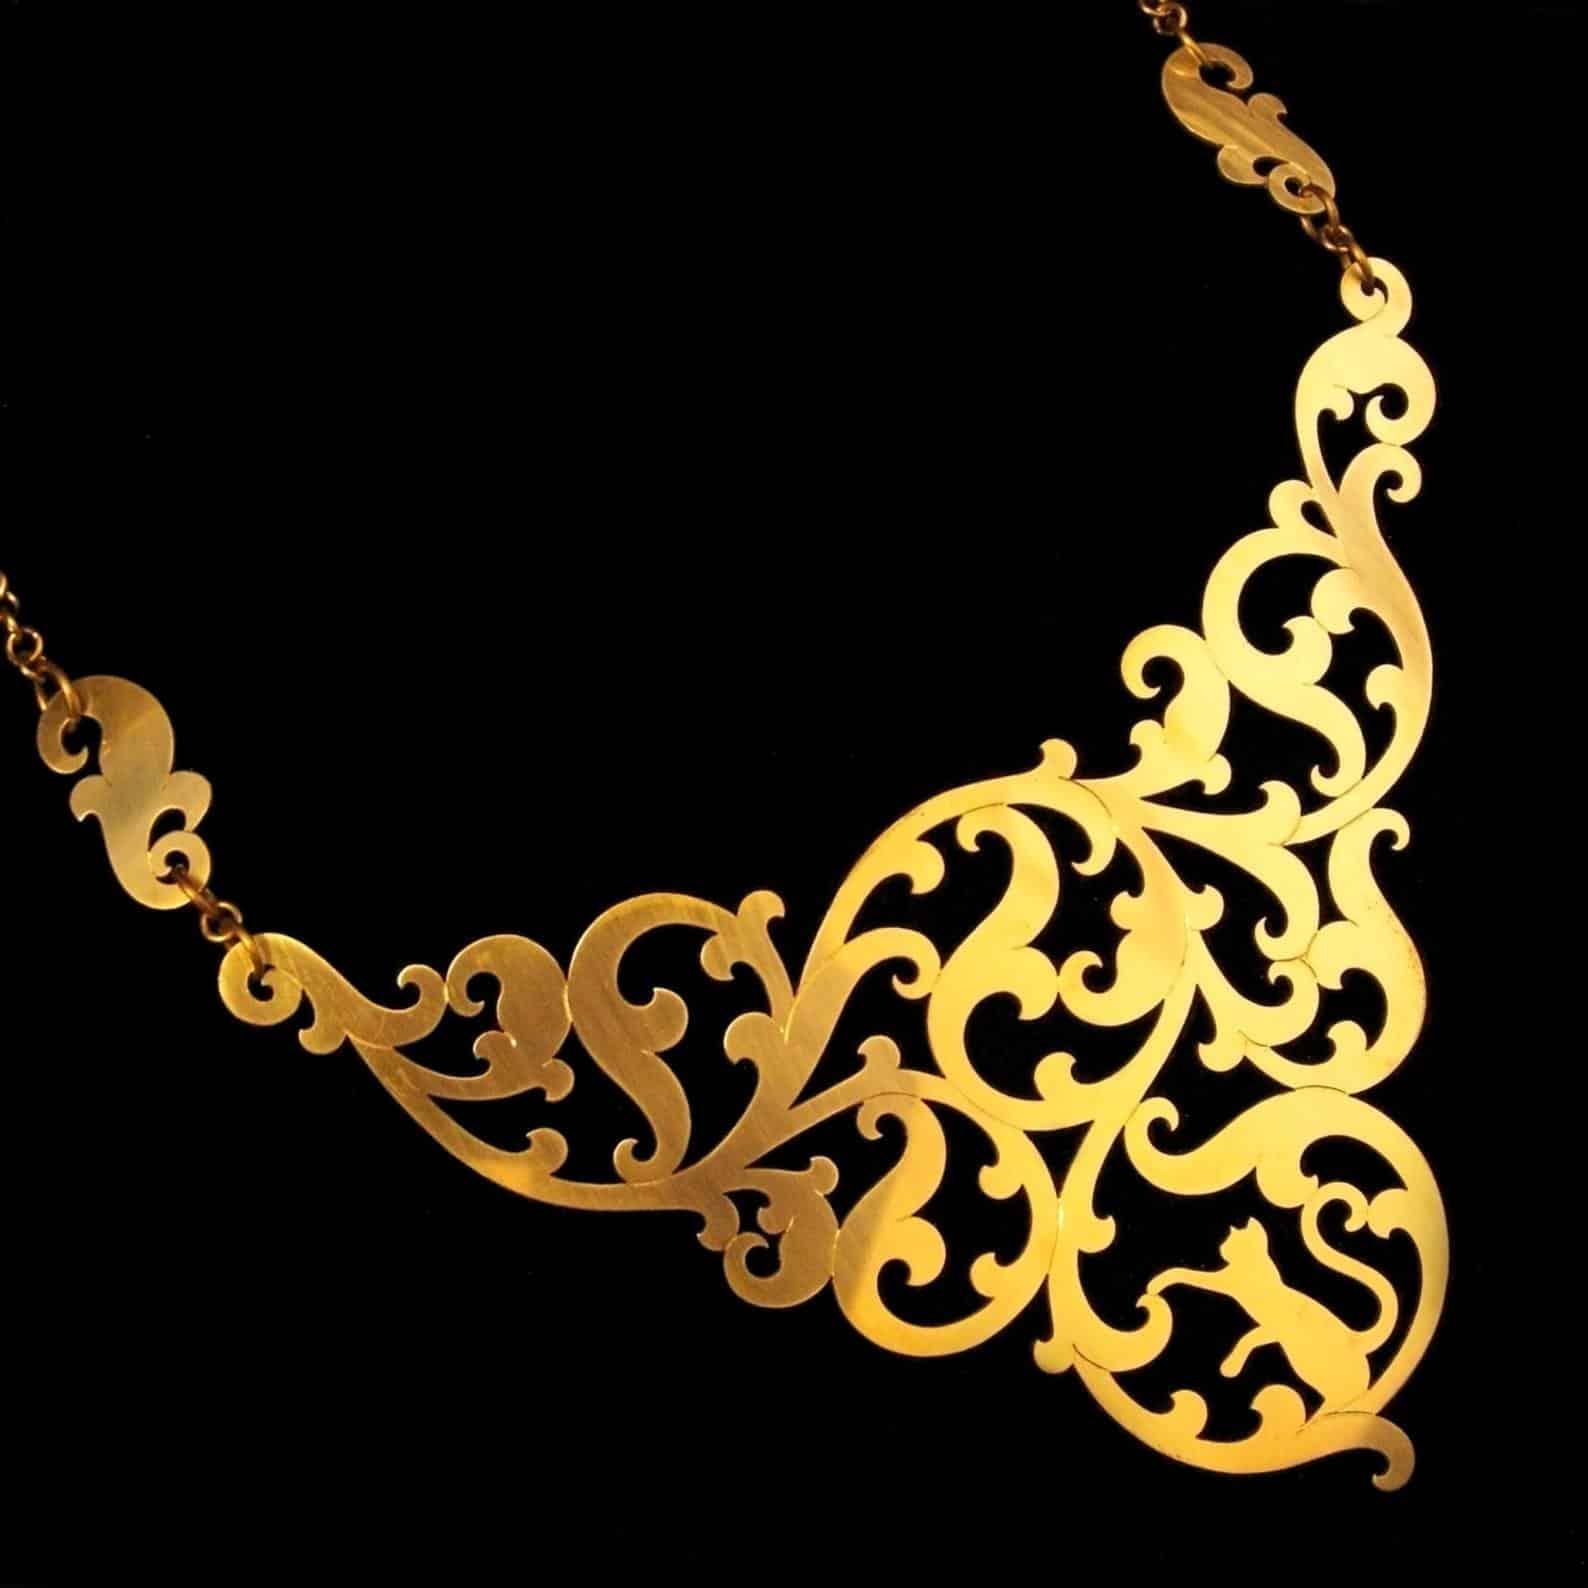 Feline In The Foliage Brass Statement Necklace By Skadi Jewellery Design